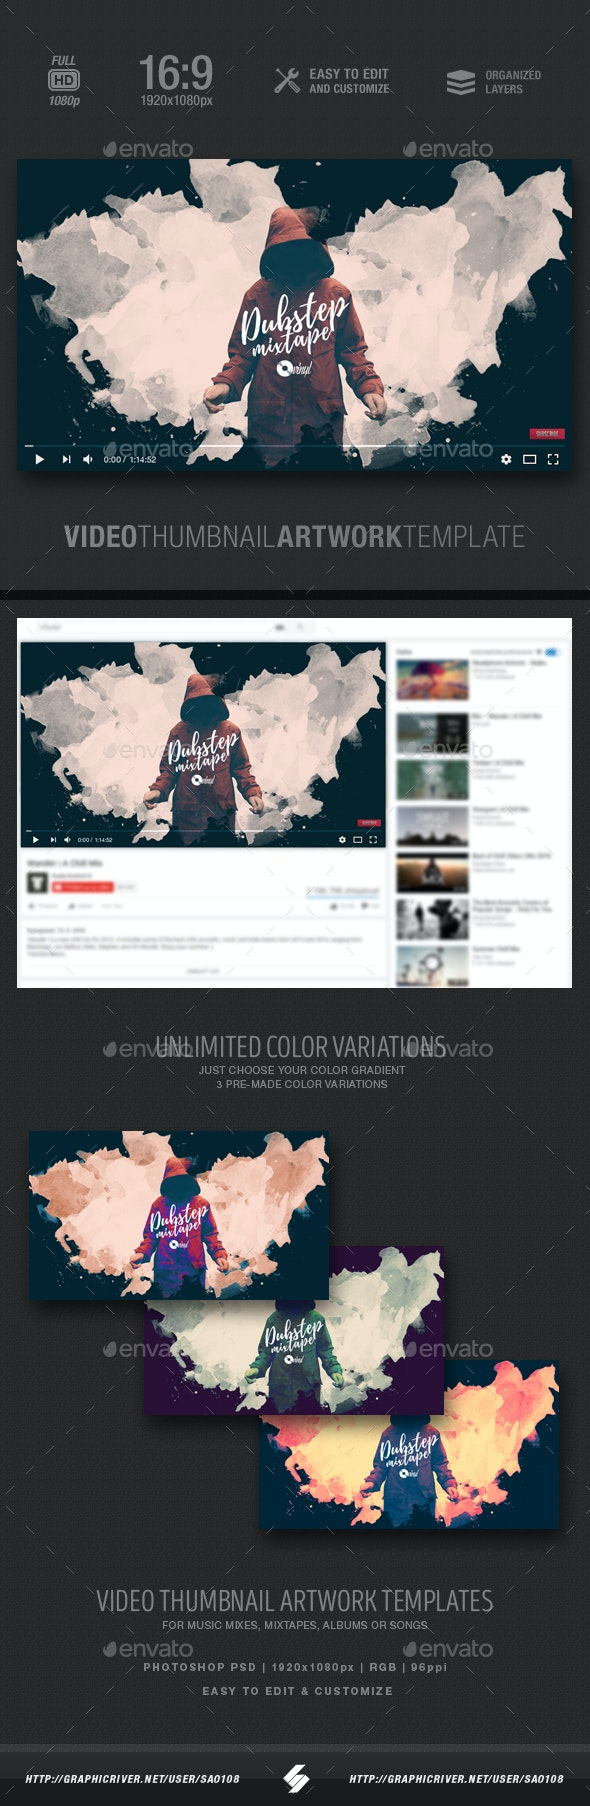 Dubstep Mixtape - Video Thumbnail Artwork Template - YouTube Social Media